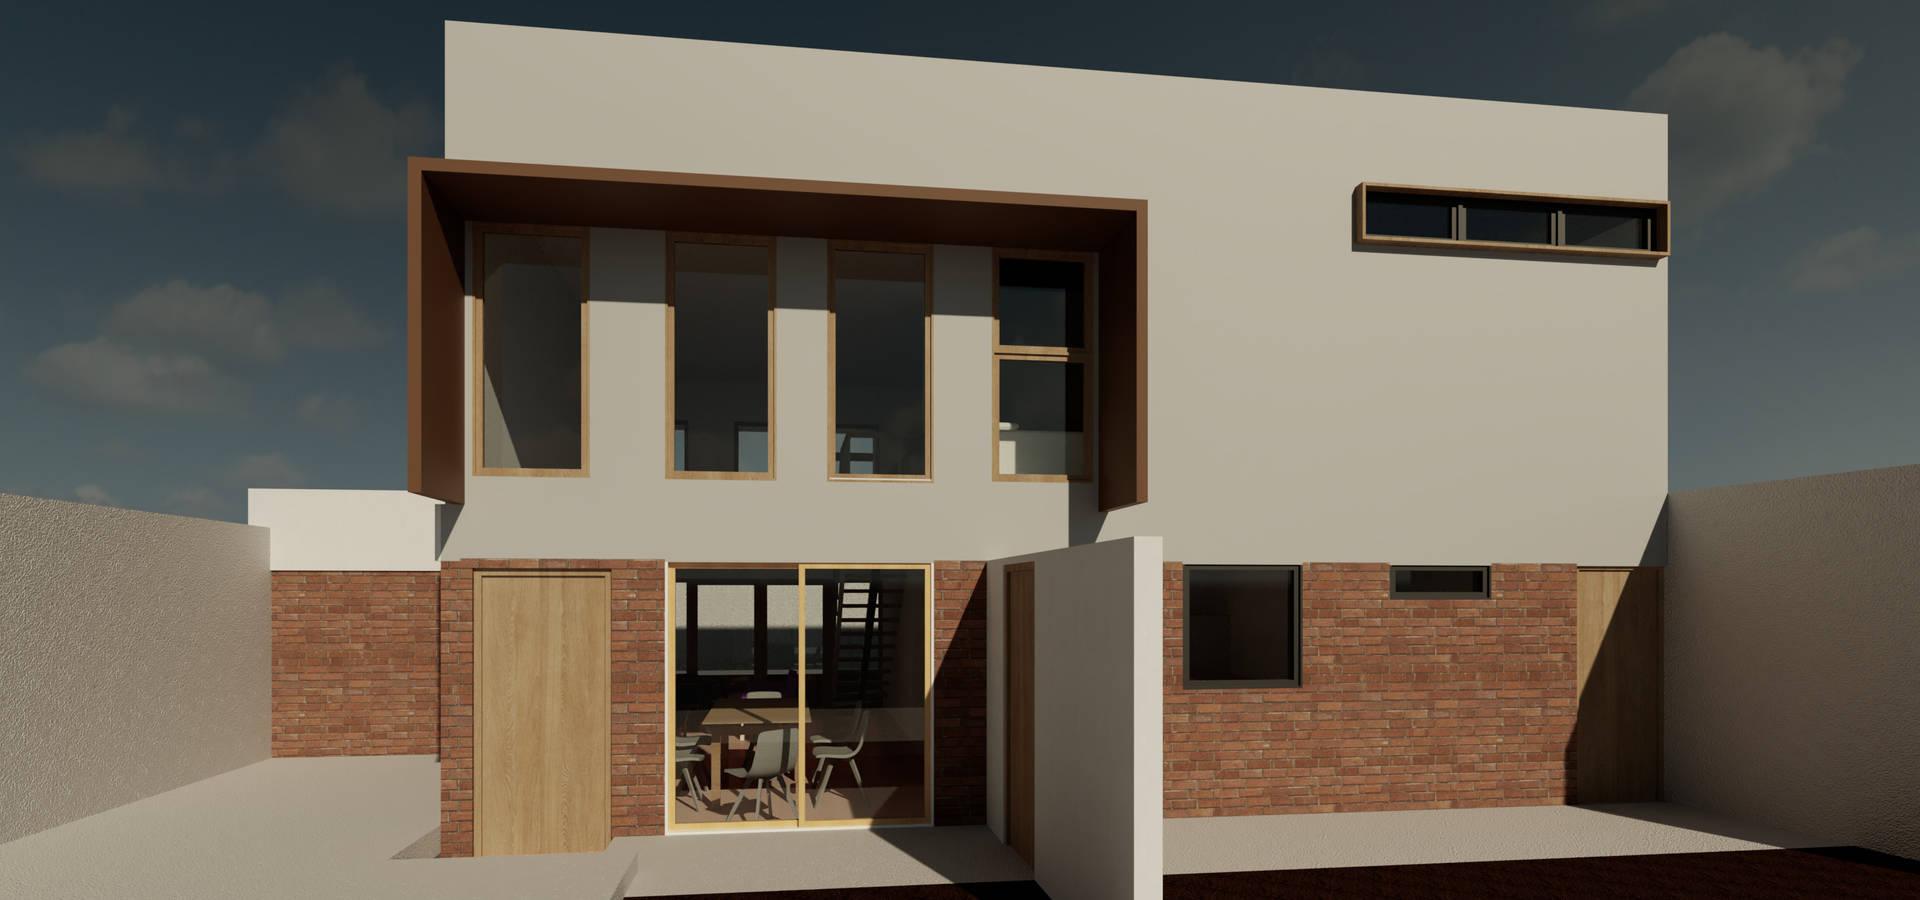 Contreras Arquitecto